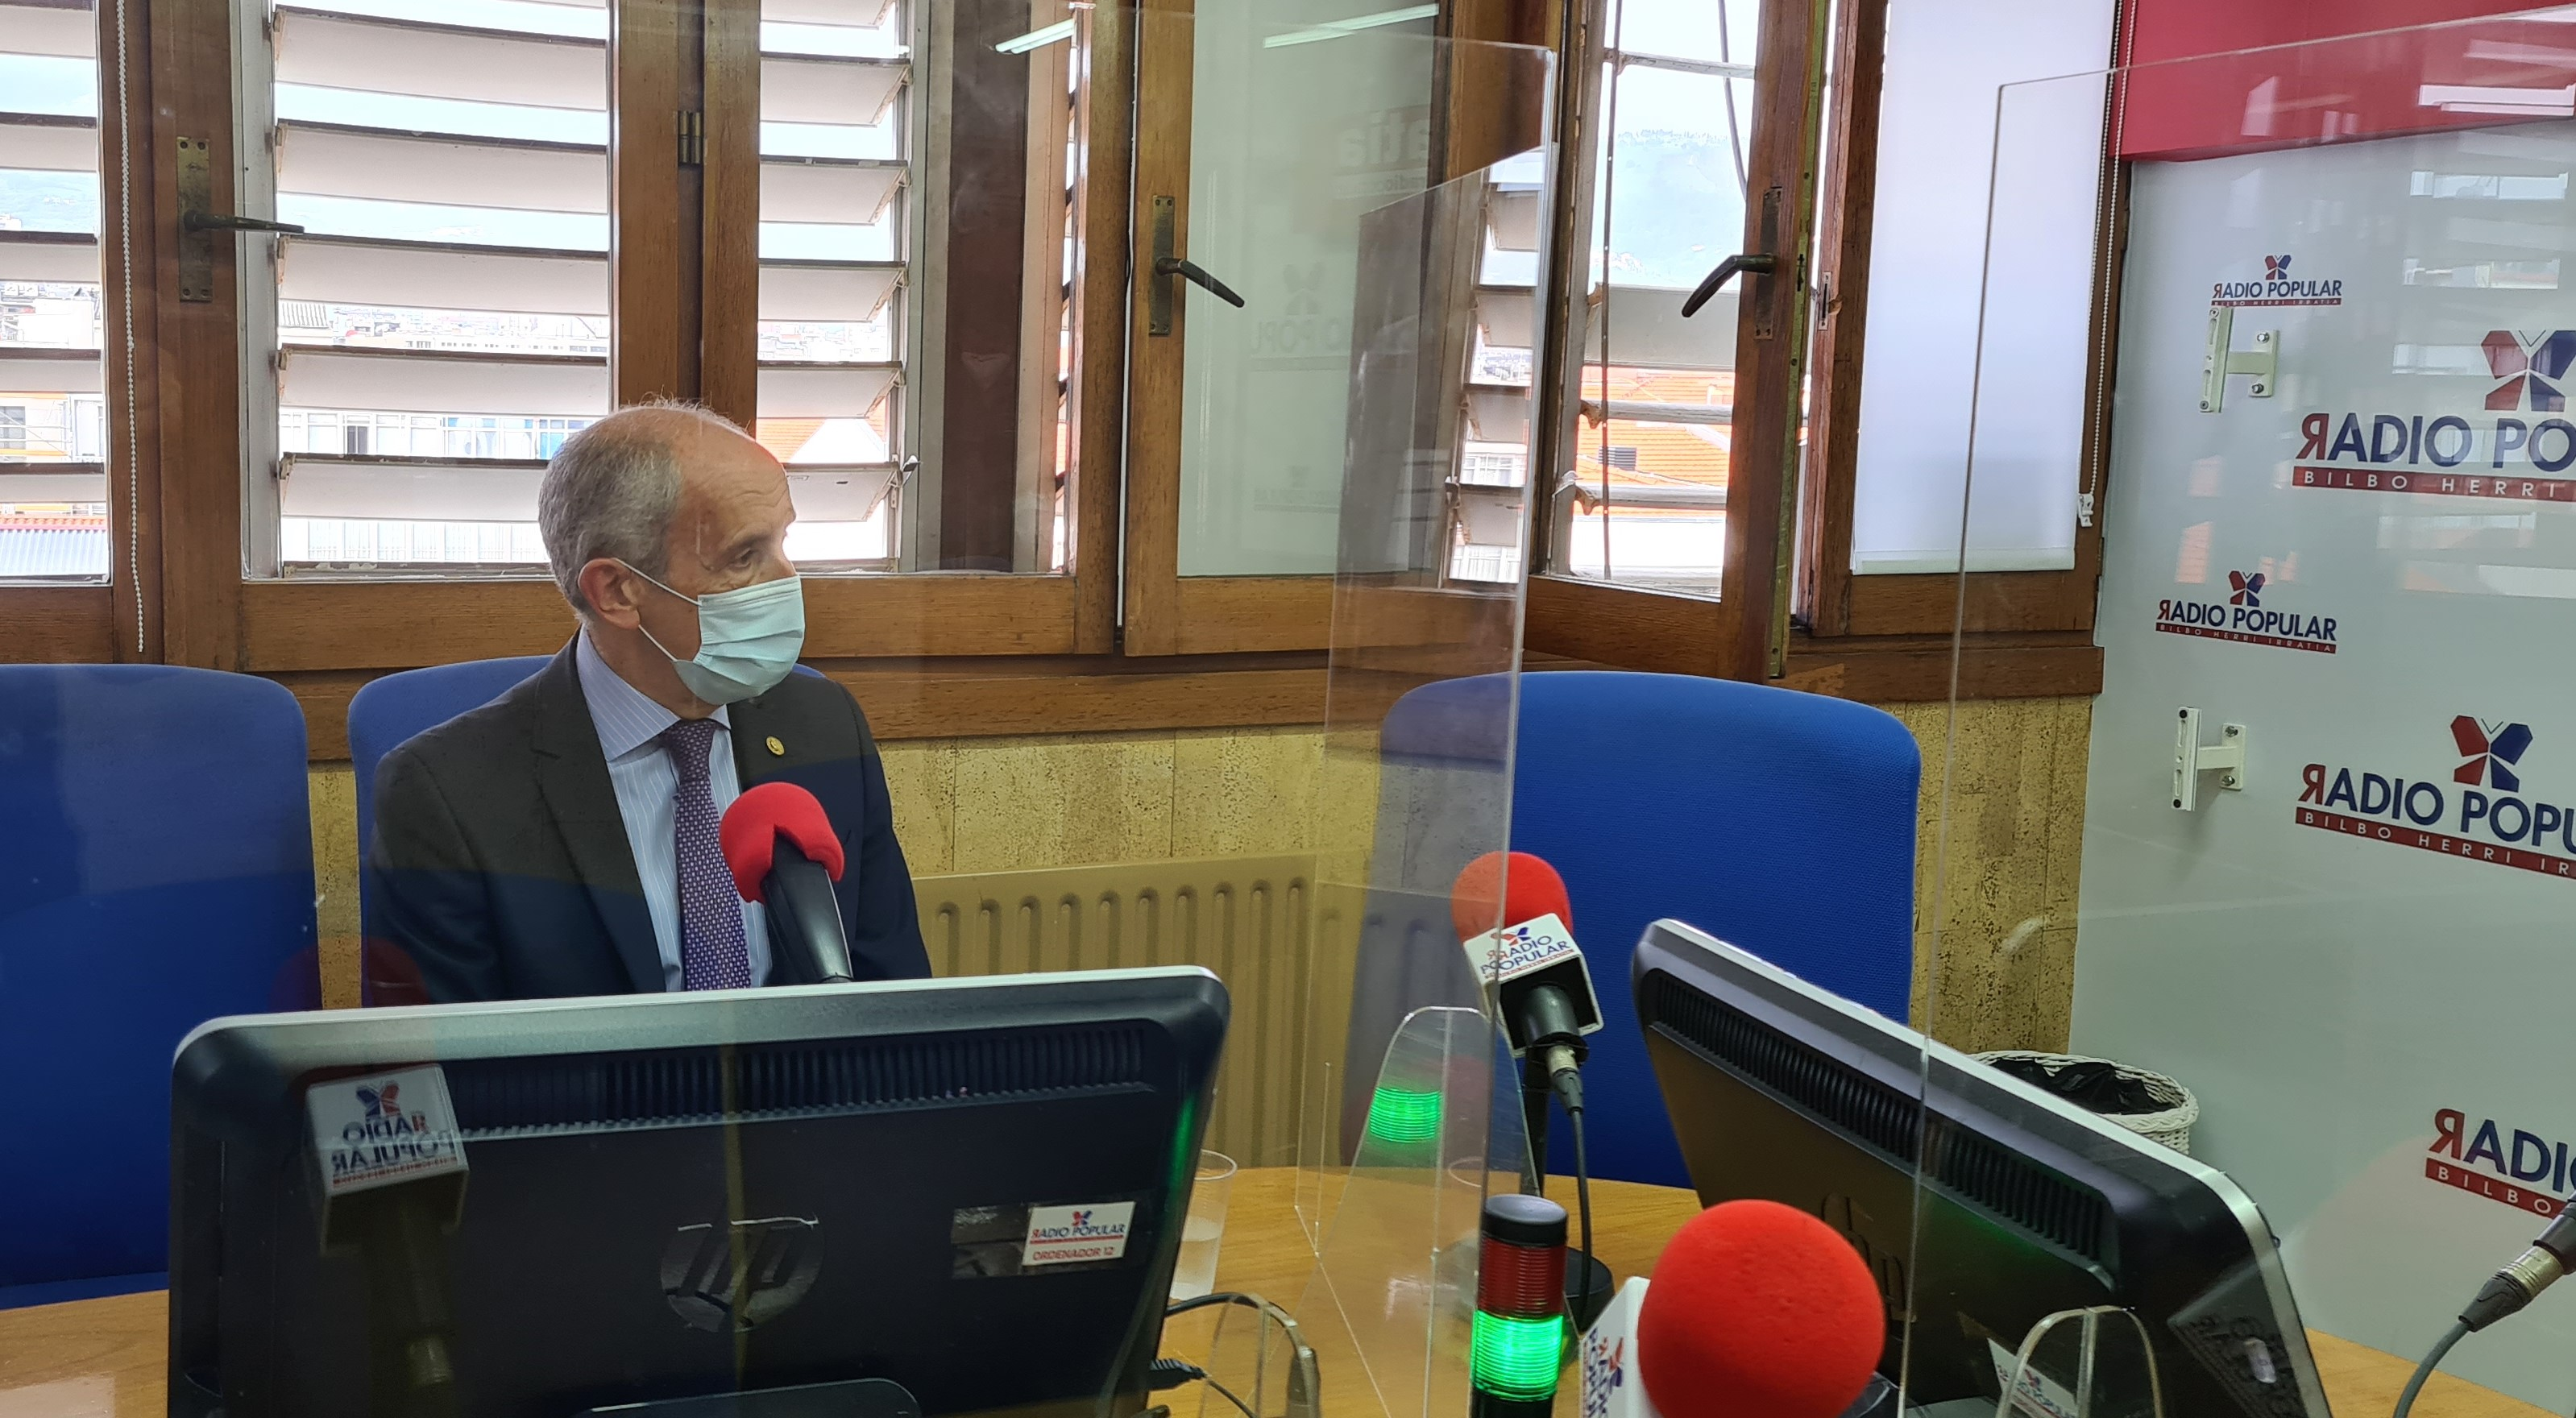 entrevista_radiopopular_elkarrizketa__4_.jpg